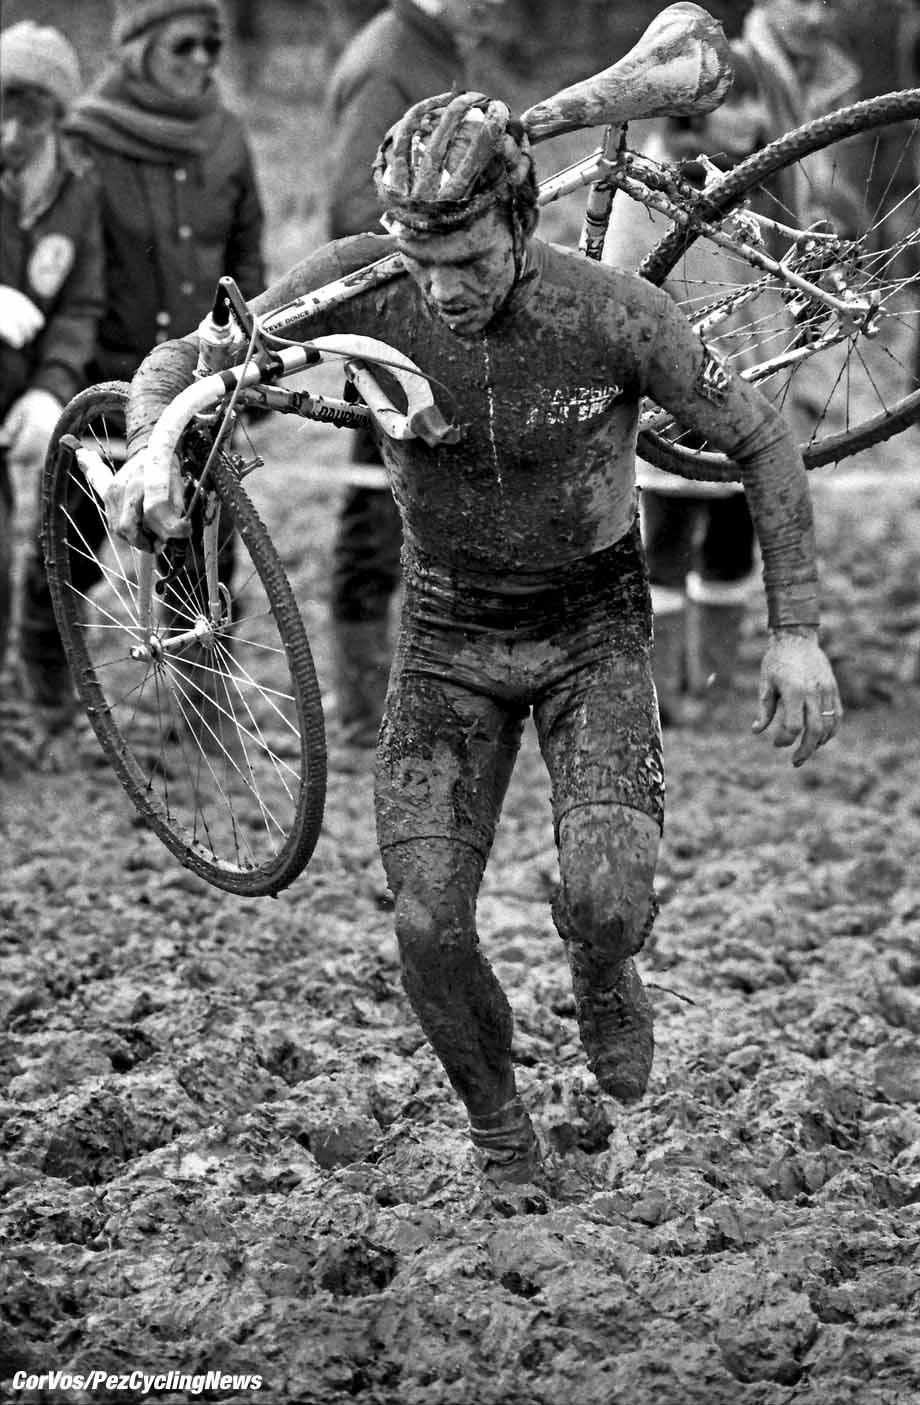 Hoogvliet - Nederland - wielrennen - cycling - cyclisme - radsport - Stephen DOUCE (GBR)  pictured during Rad-Querfeldein - Cross - Cyclocross 1986 - photo Cor Vos © 2017